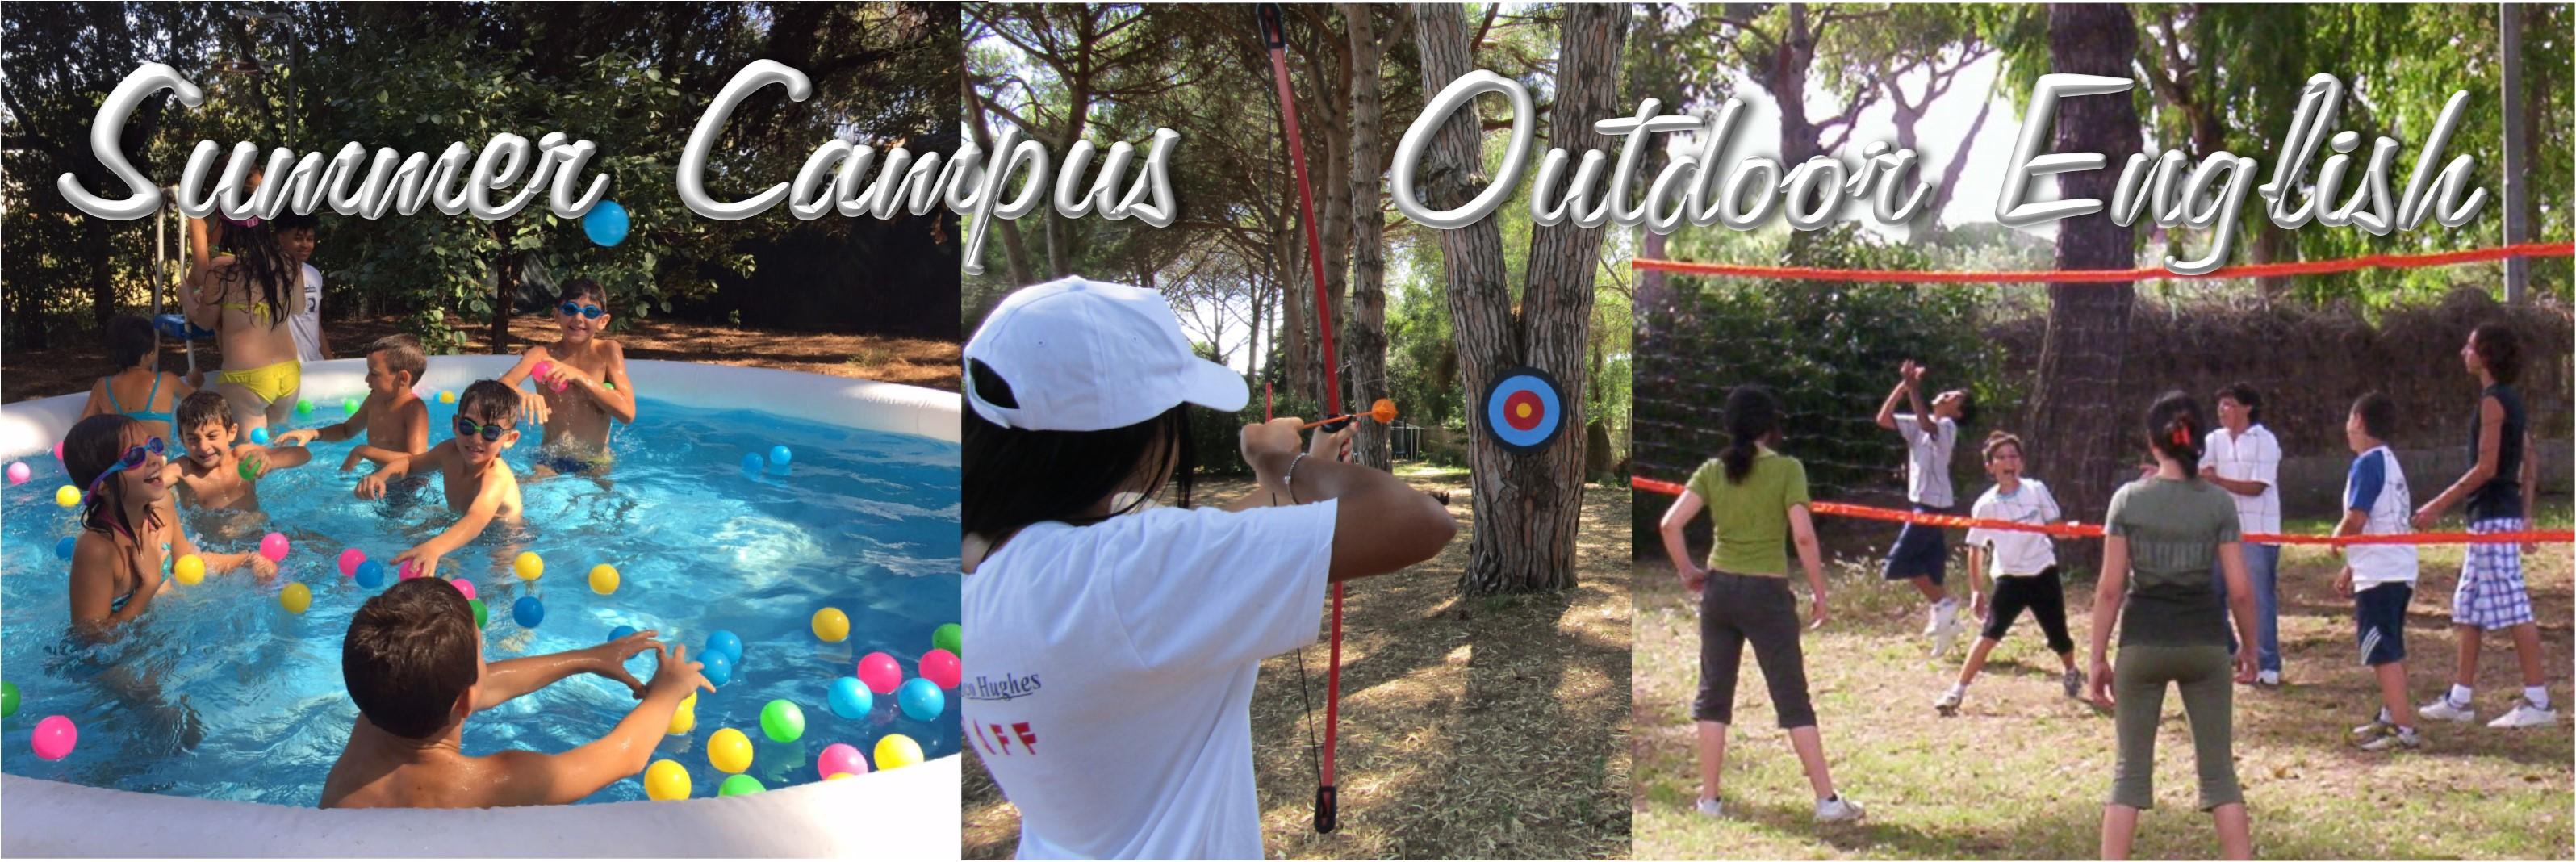 Summer Campus Outdoor